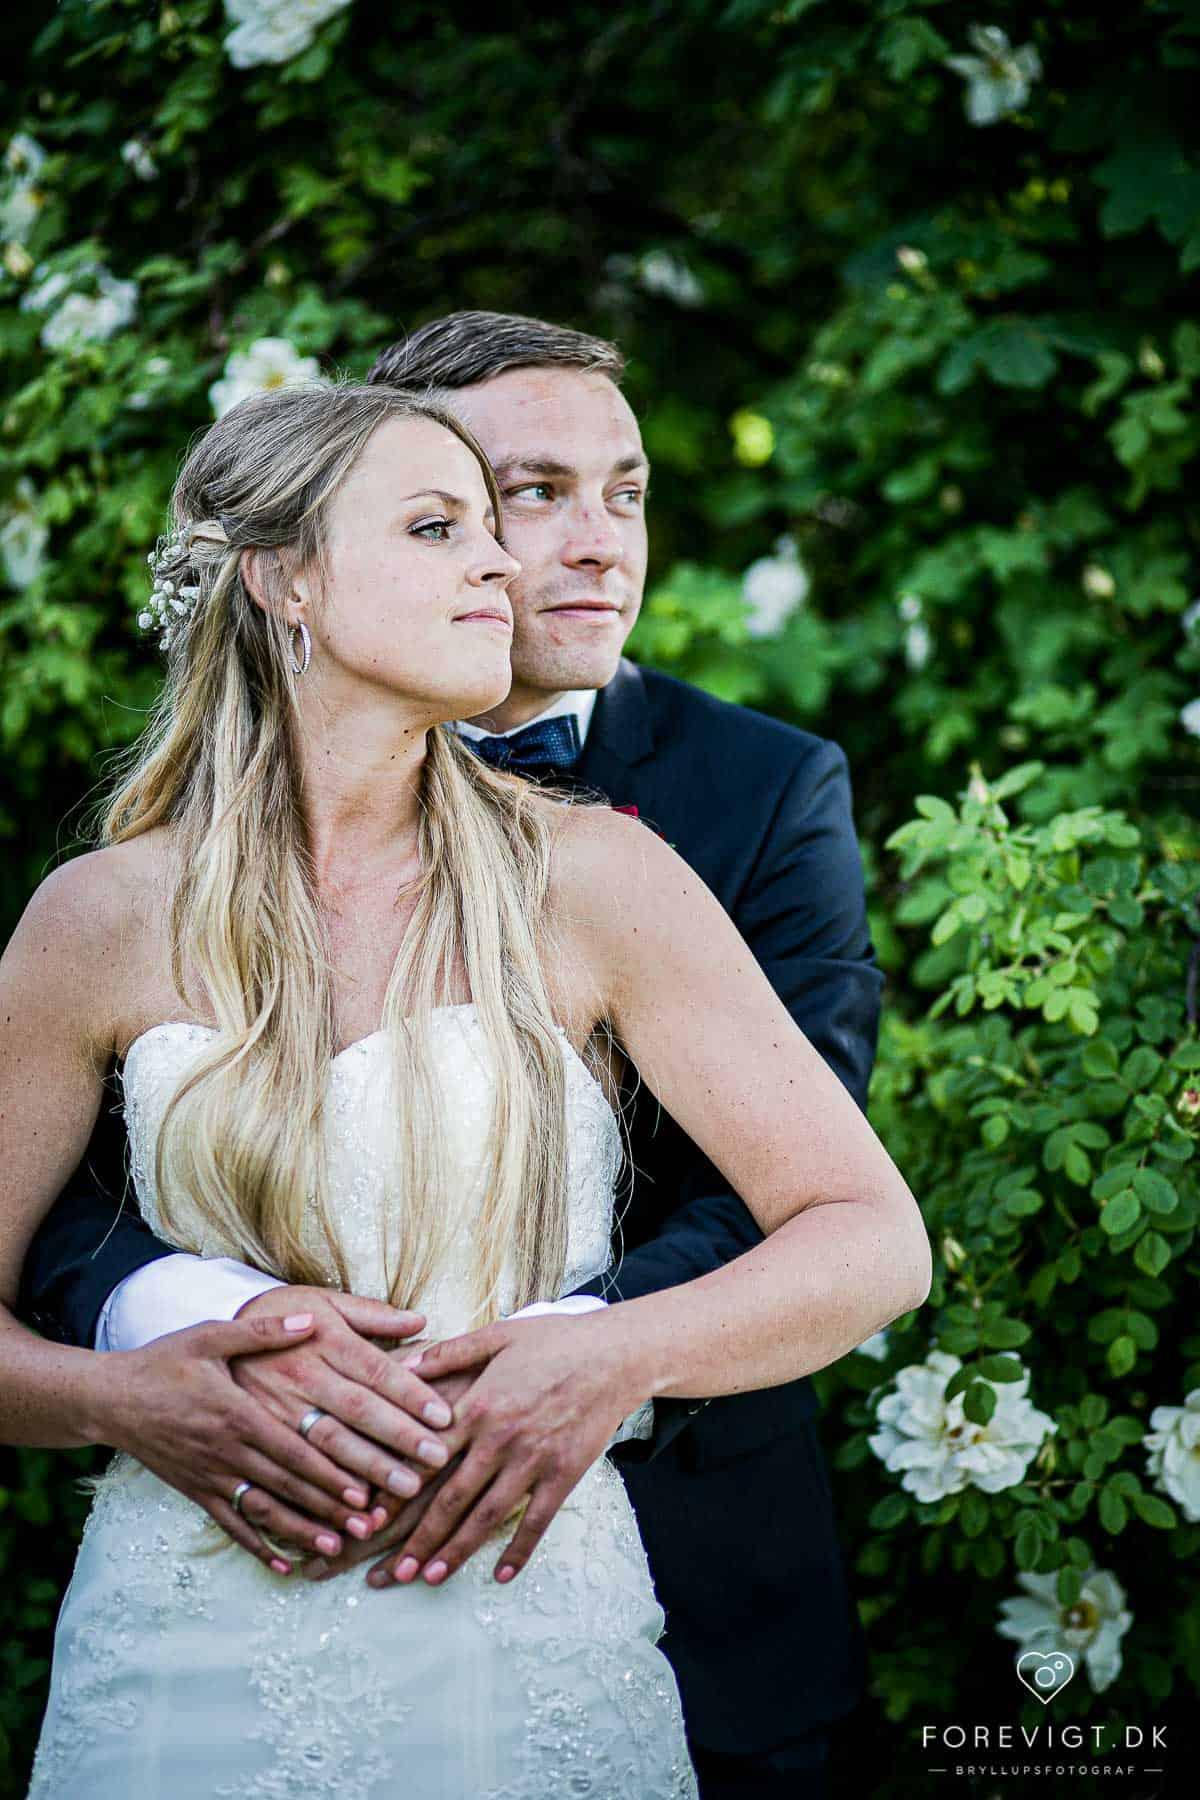 Bryllup på Sjælland - Bryllupsfotograf   Bryllups foto   Fotograf ...